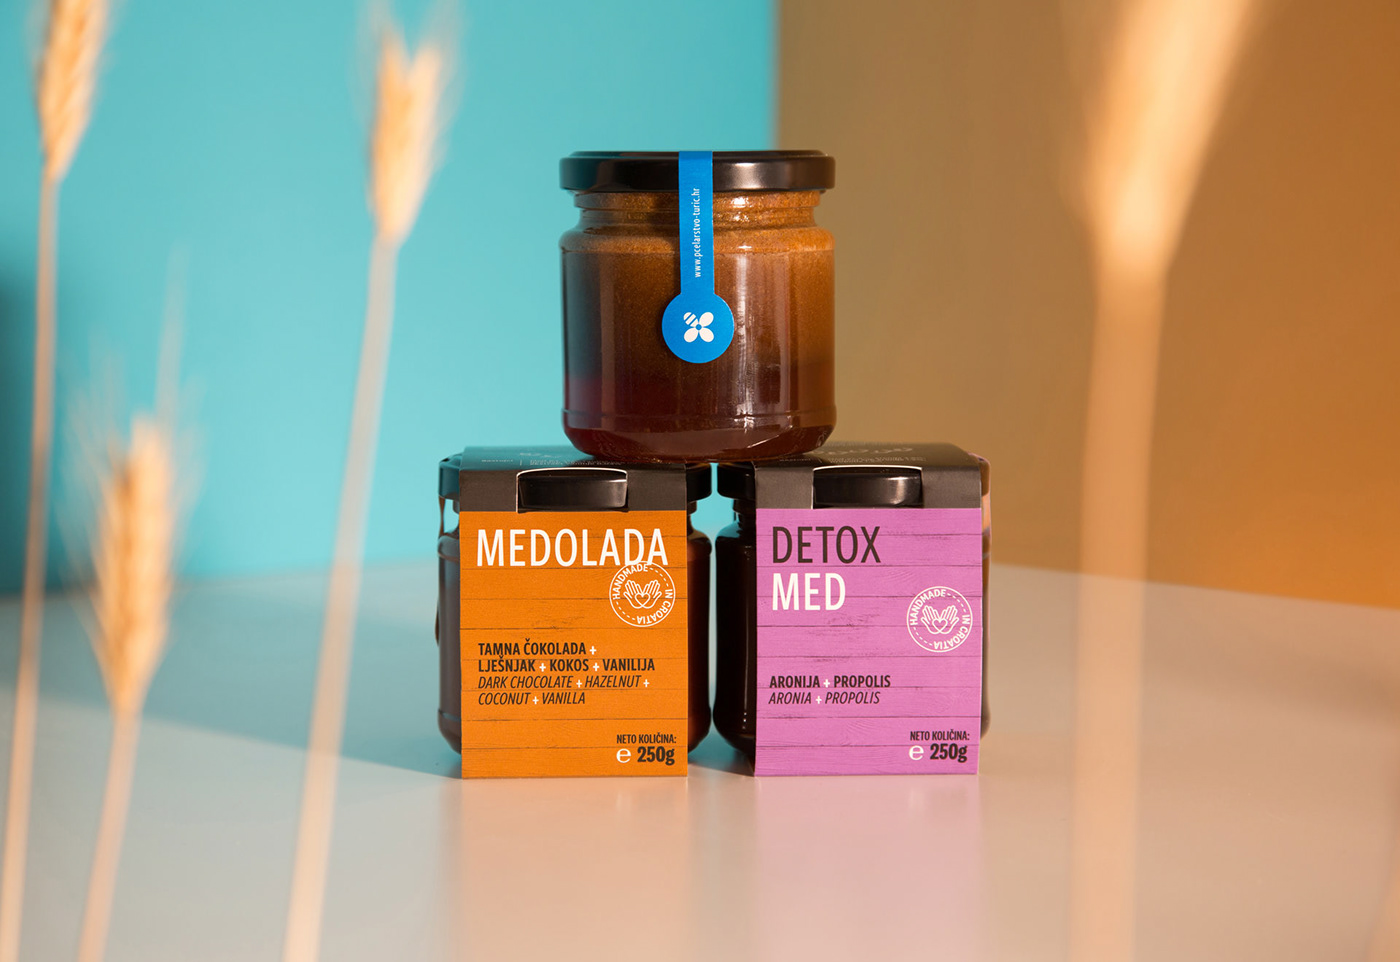 Honey package design, vibrant colors